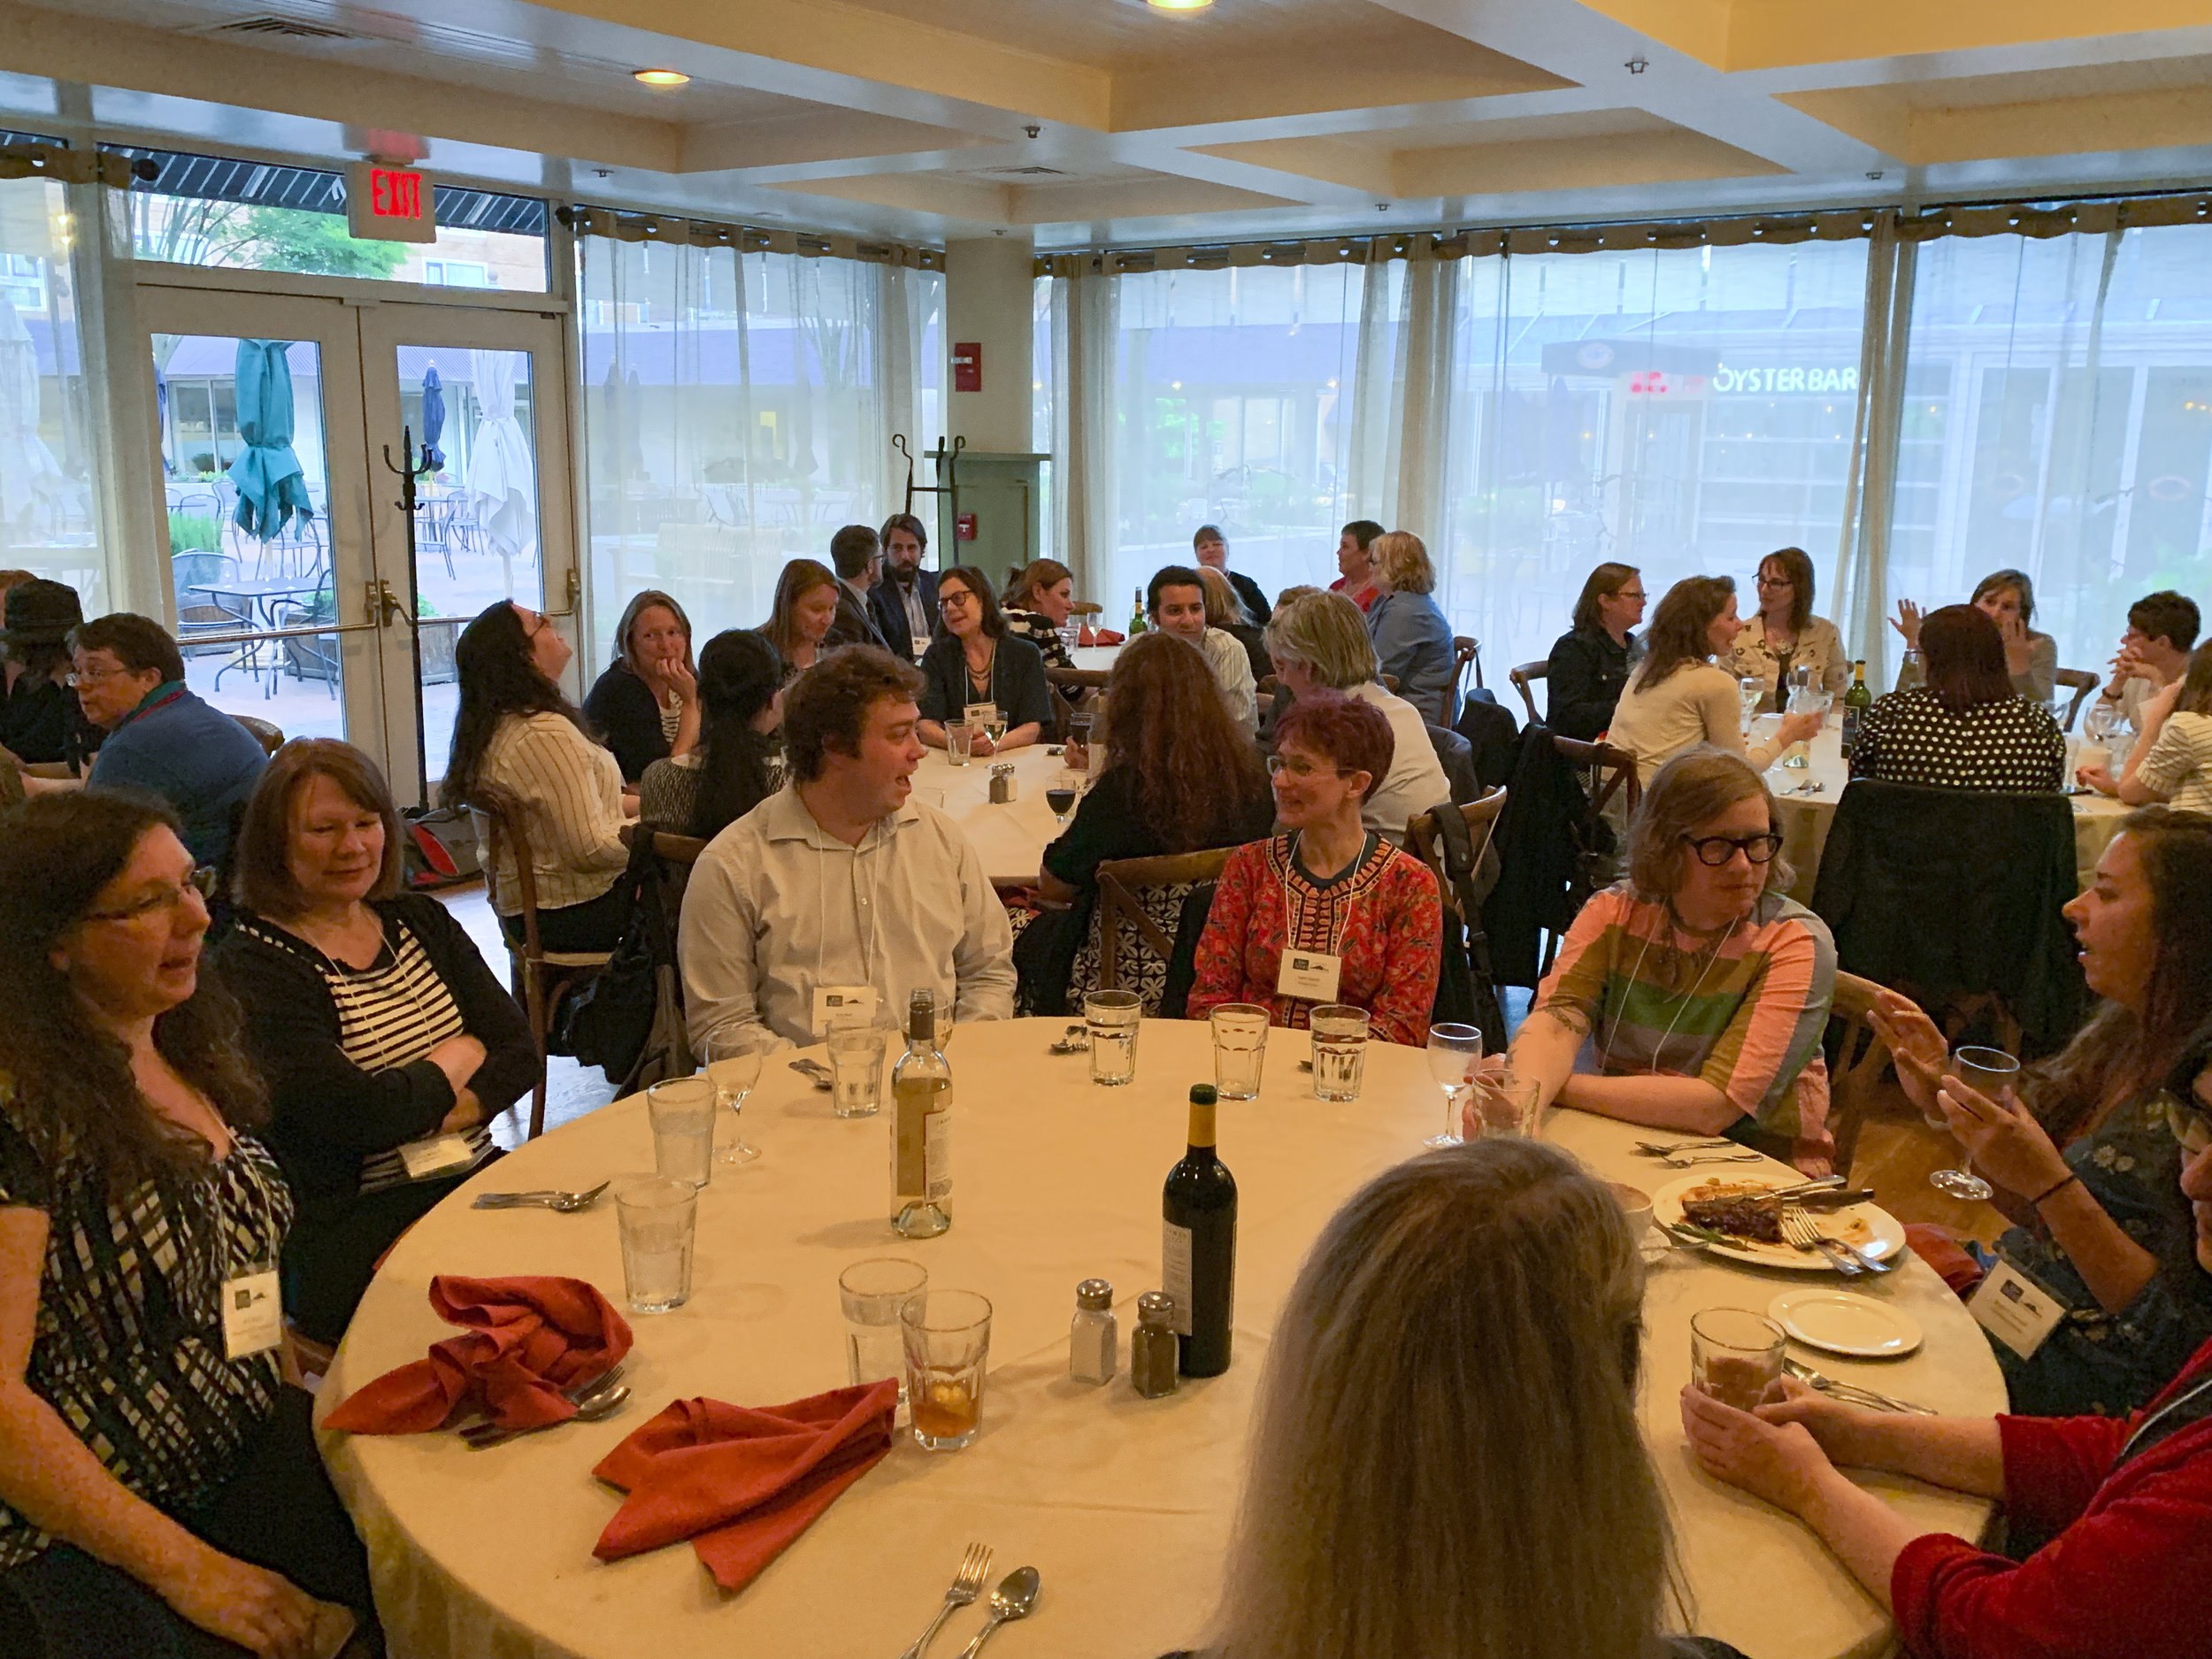 Aeon Symposium dinner - photo by Cassandra Norman